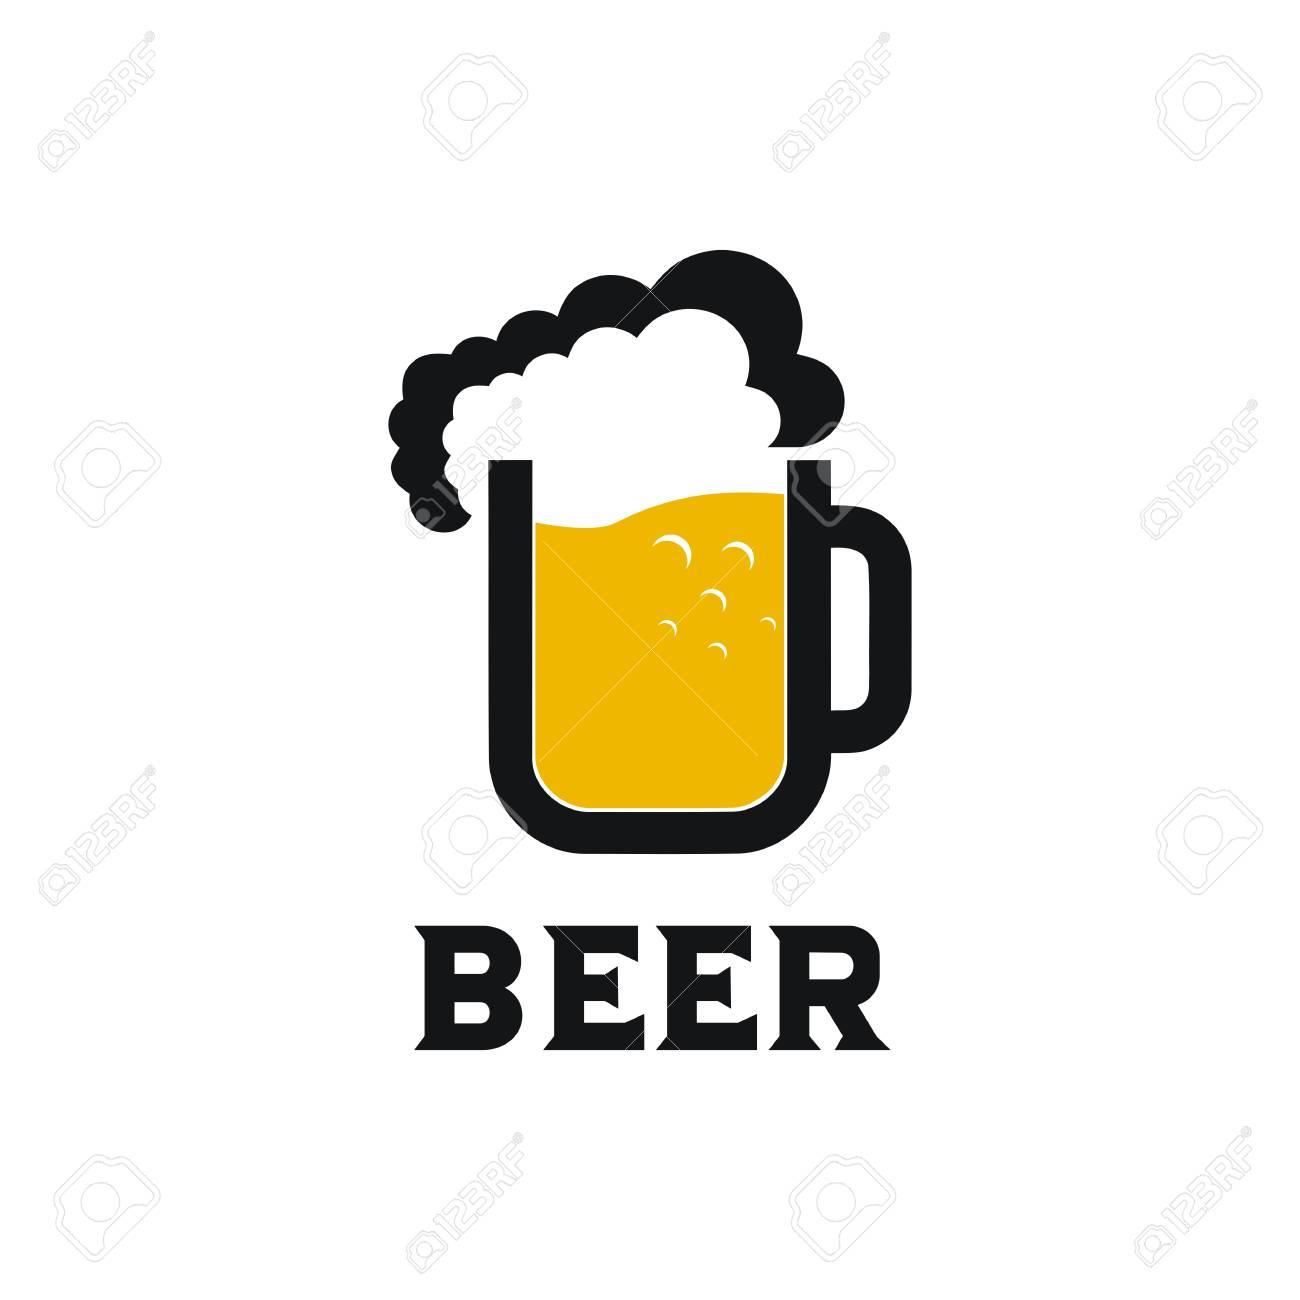 Beer mug logo vector design illustration.